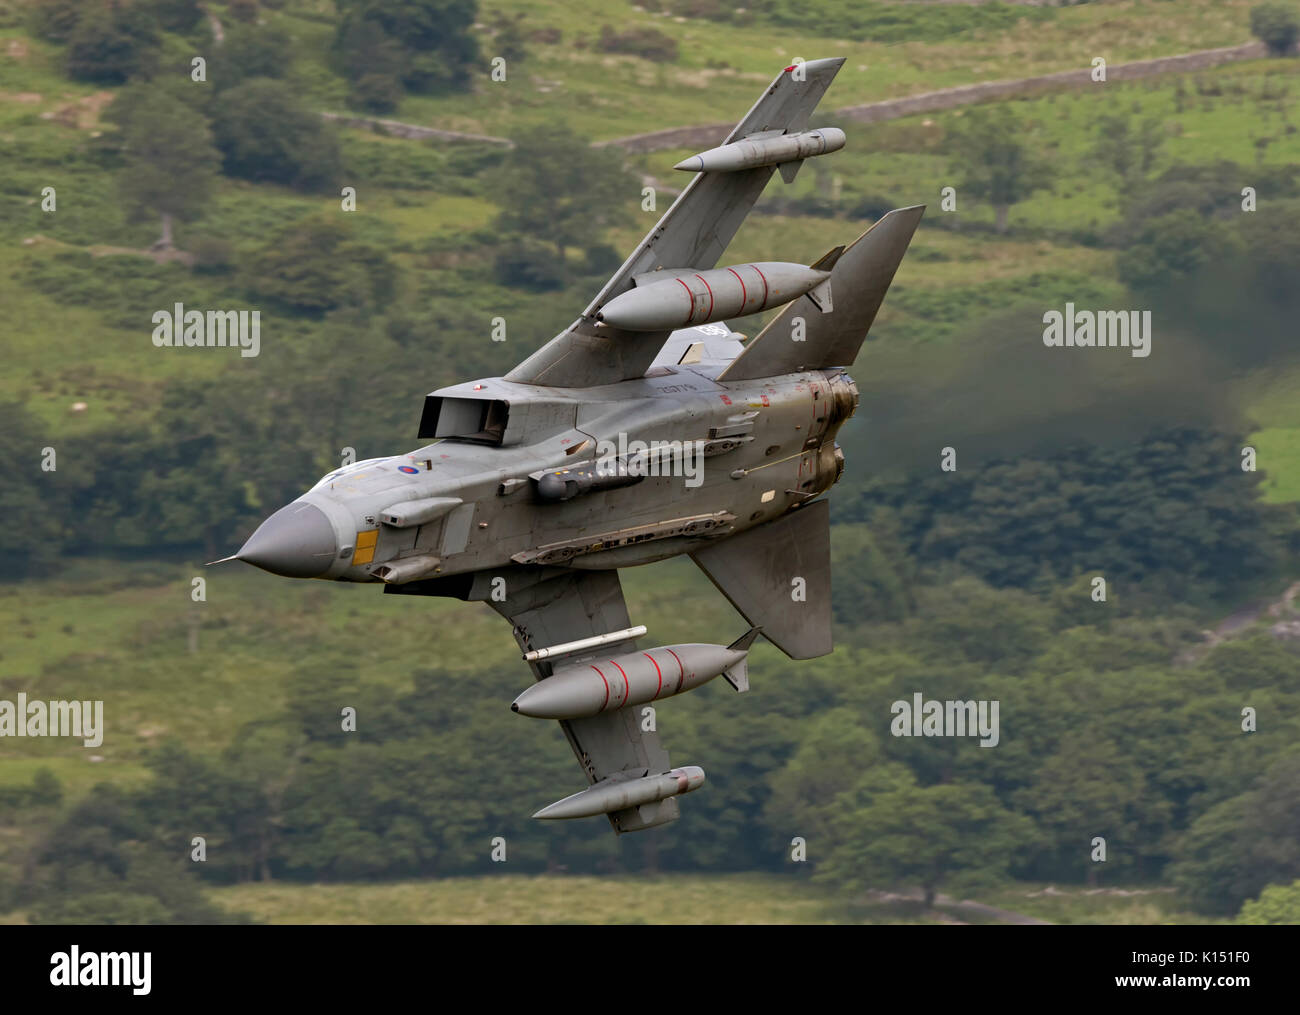 RAF Tornado GR4 on a low level flying sortie in the Mach Loop LFA7 Stock Photo